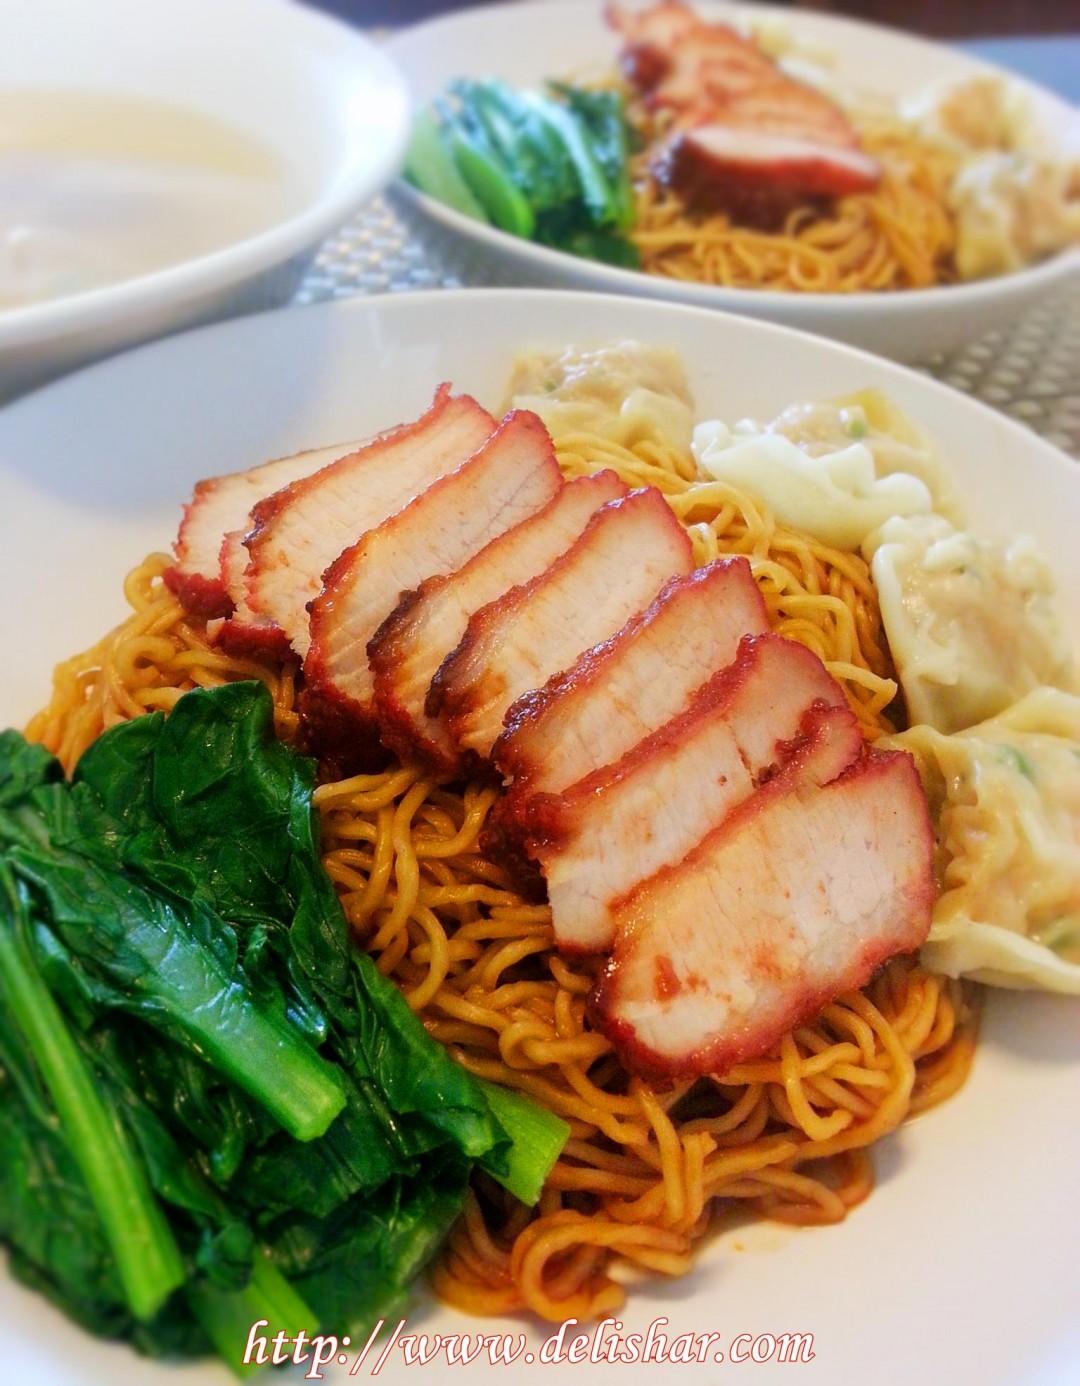 Char Siew Wanton Noodles Delishar Singapore Cooking Blog